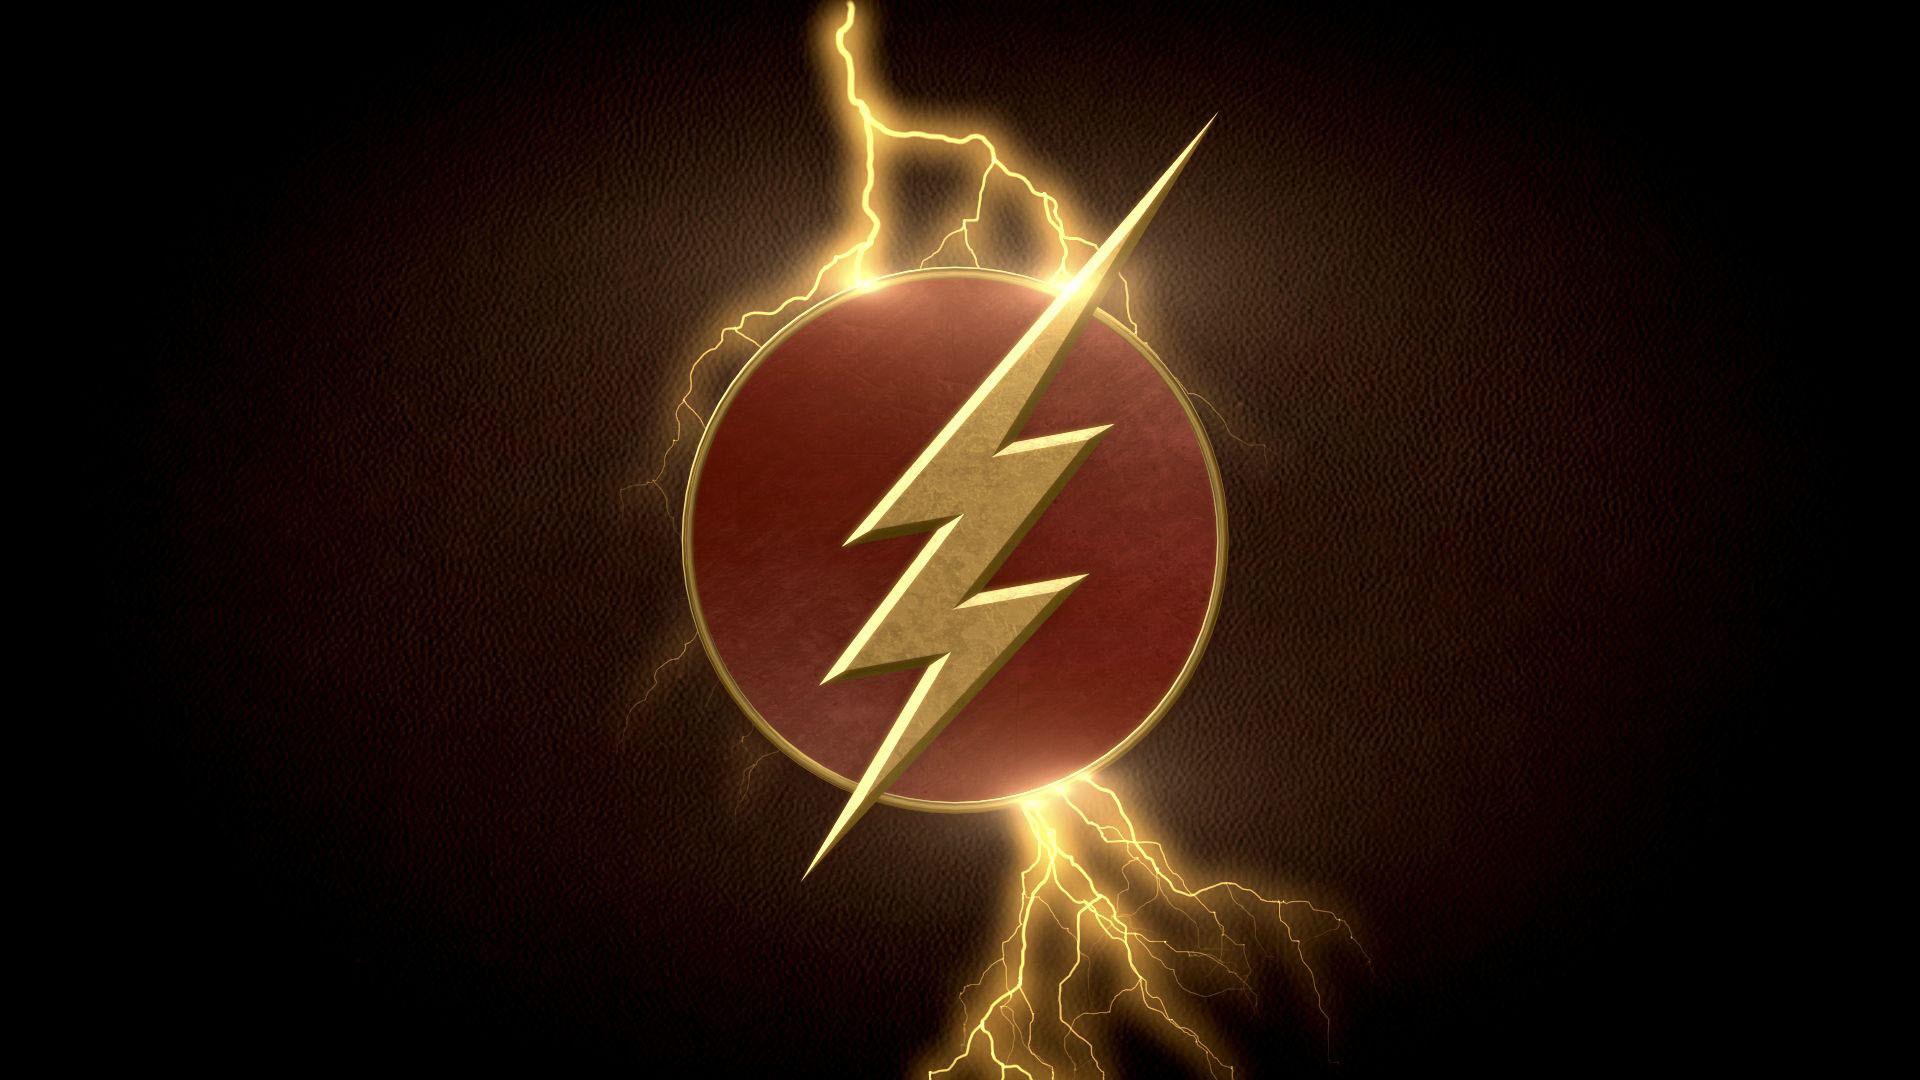 Flash Symbol Wallpaper (43 Wallpapers)